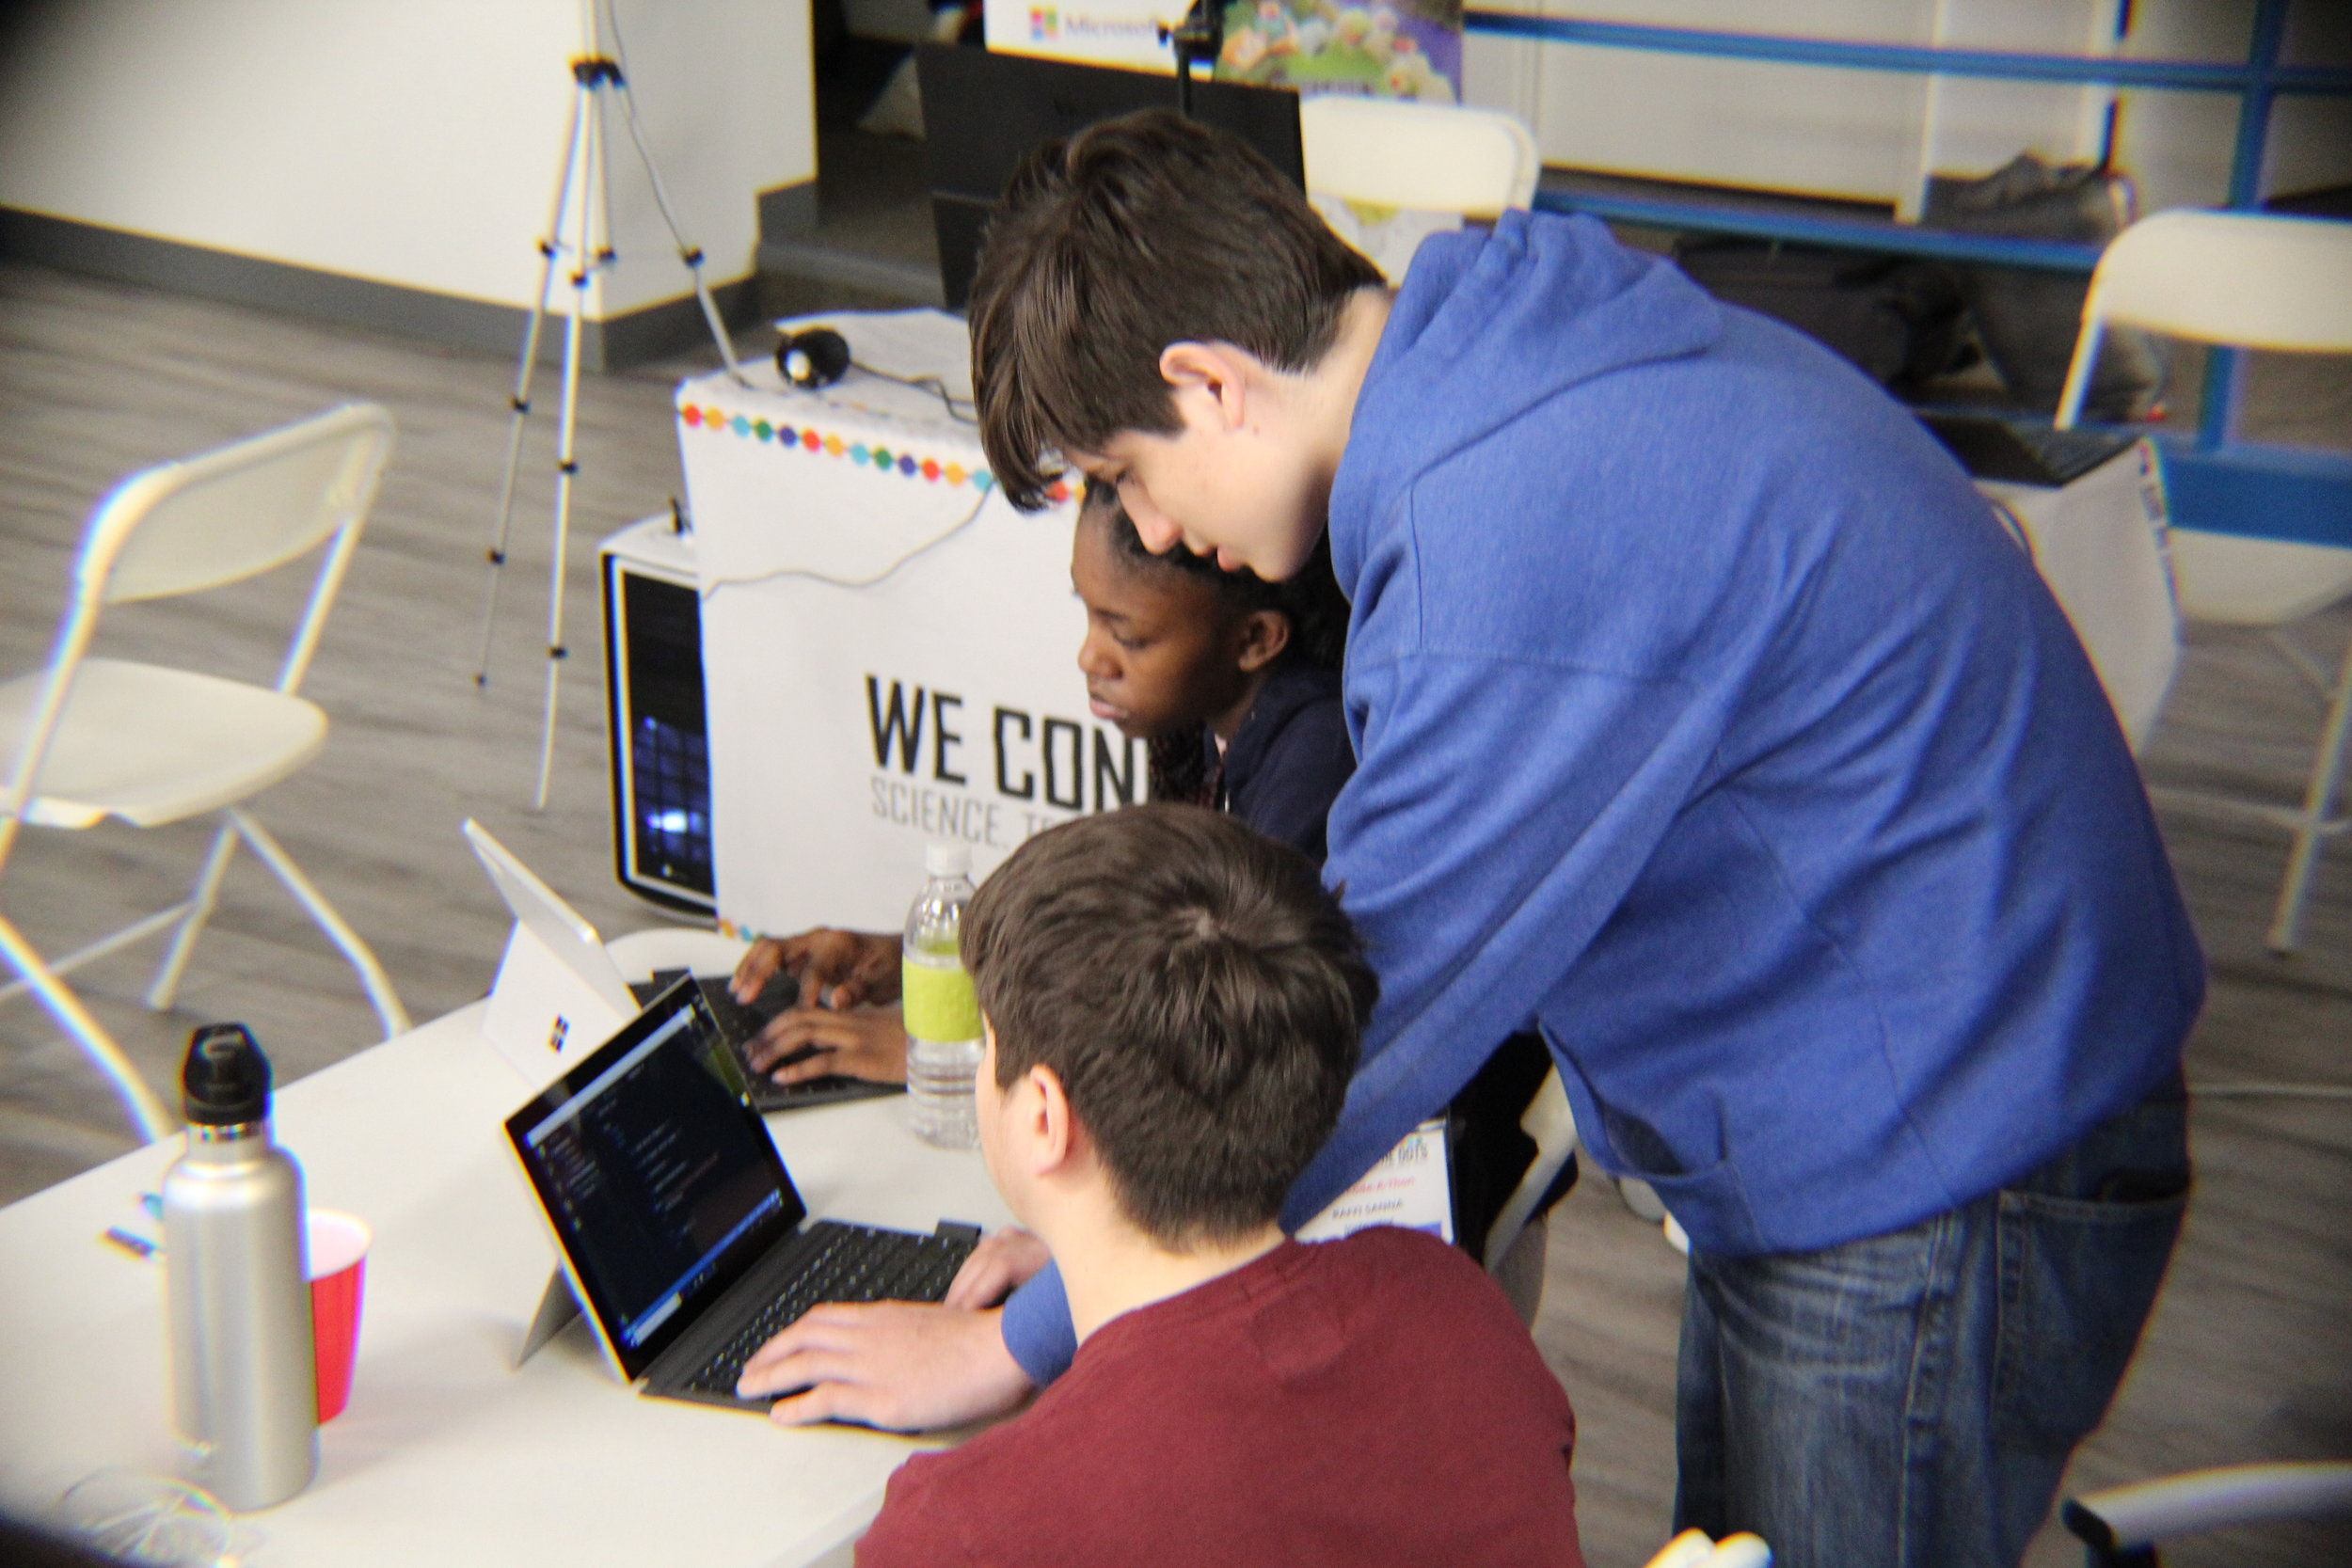 Raffi Sanna - Westbury Site - Instructor for first year participants